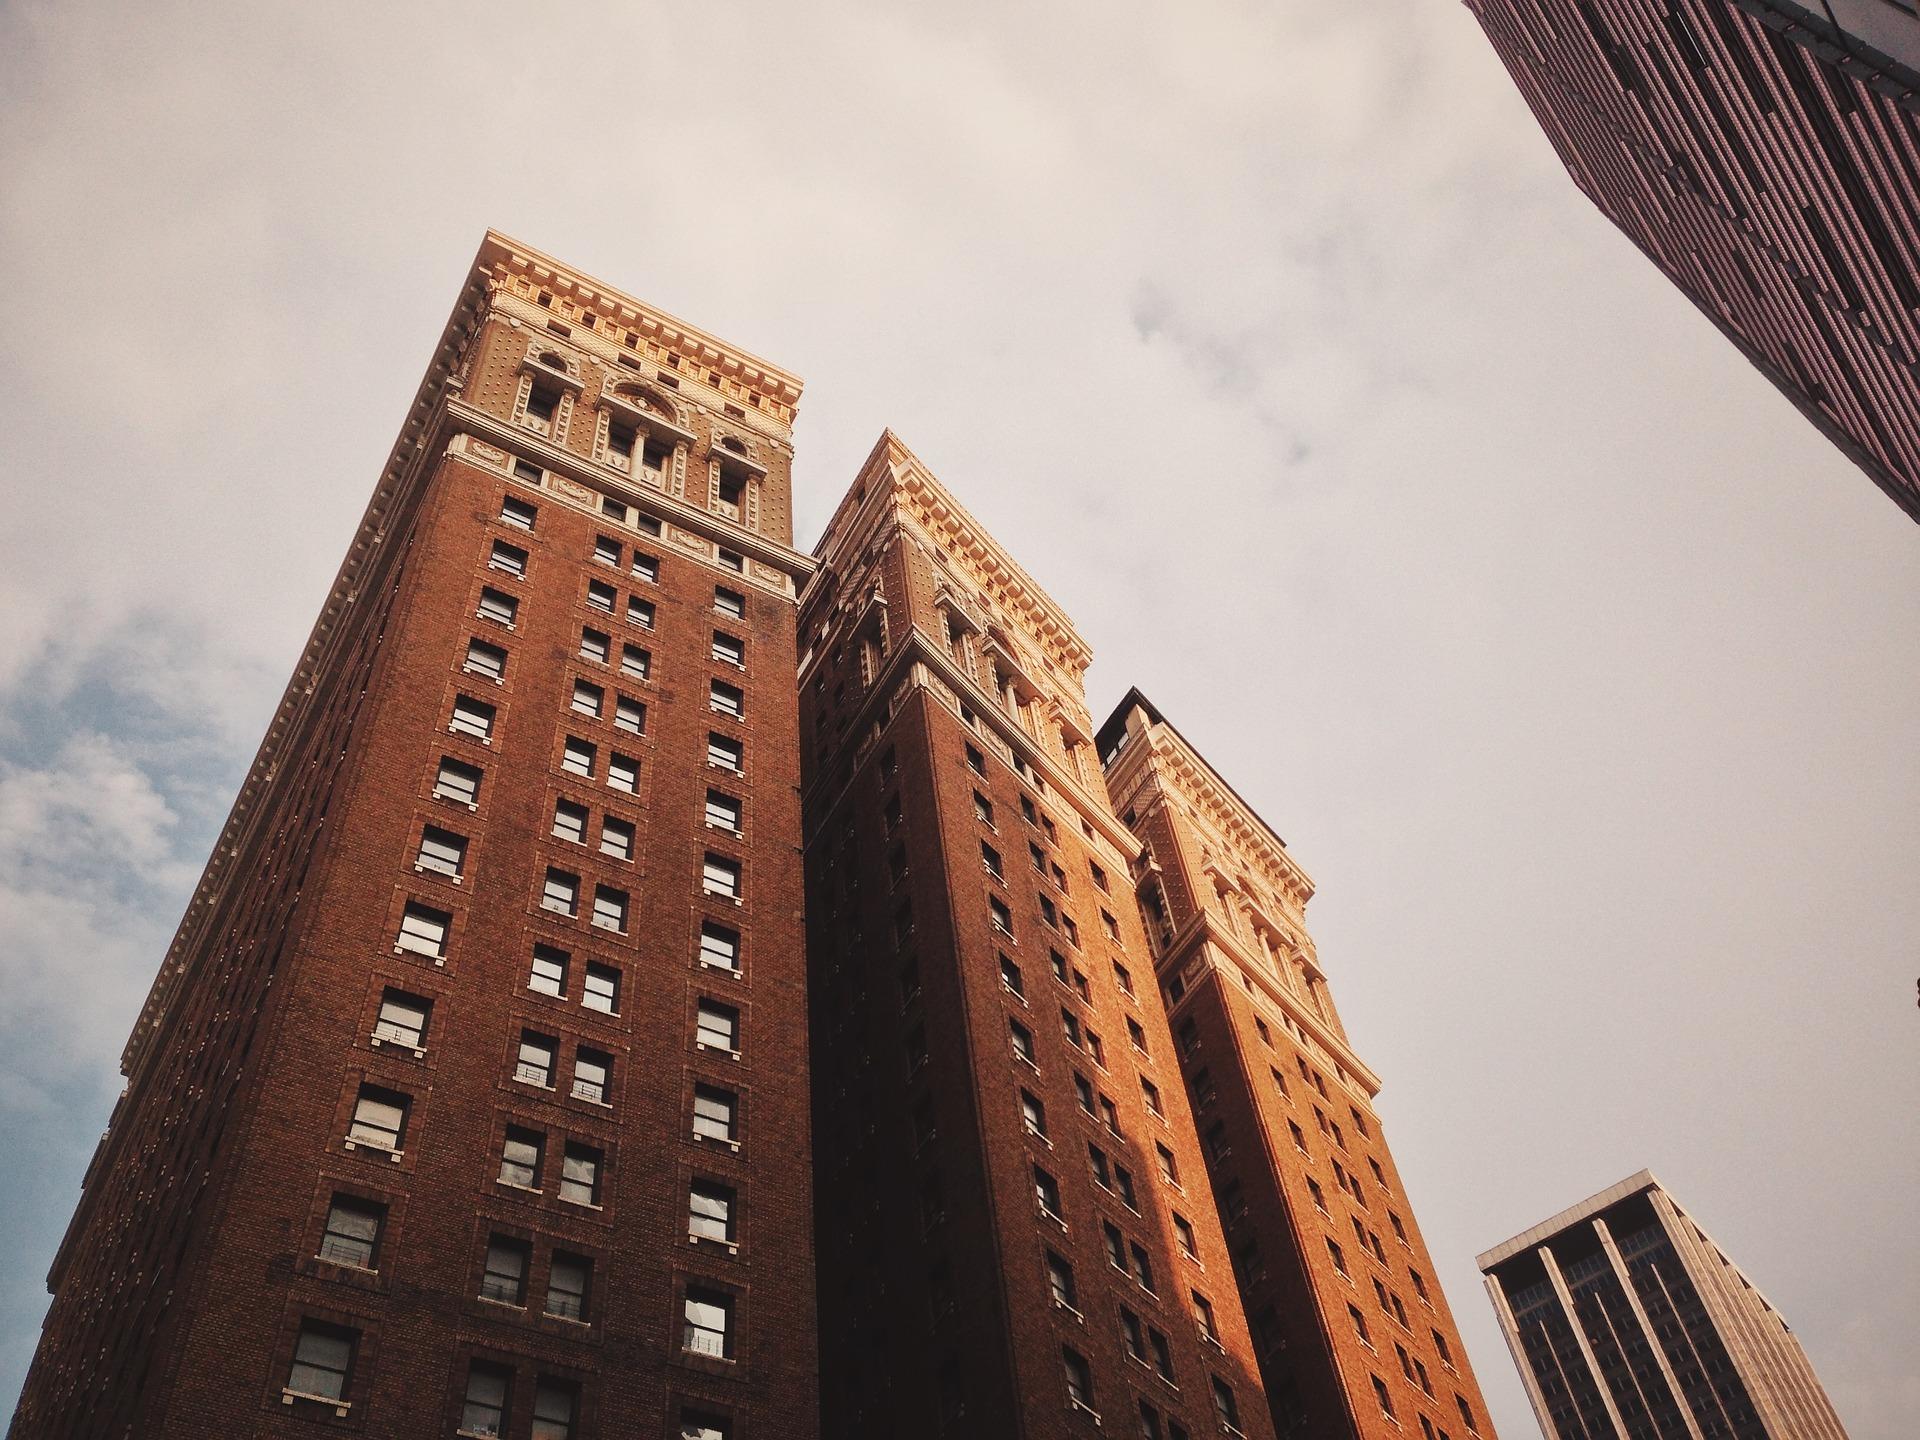 Three apartment complexes